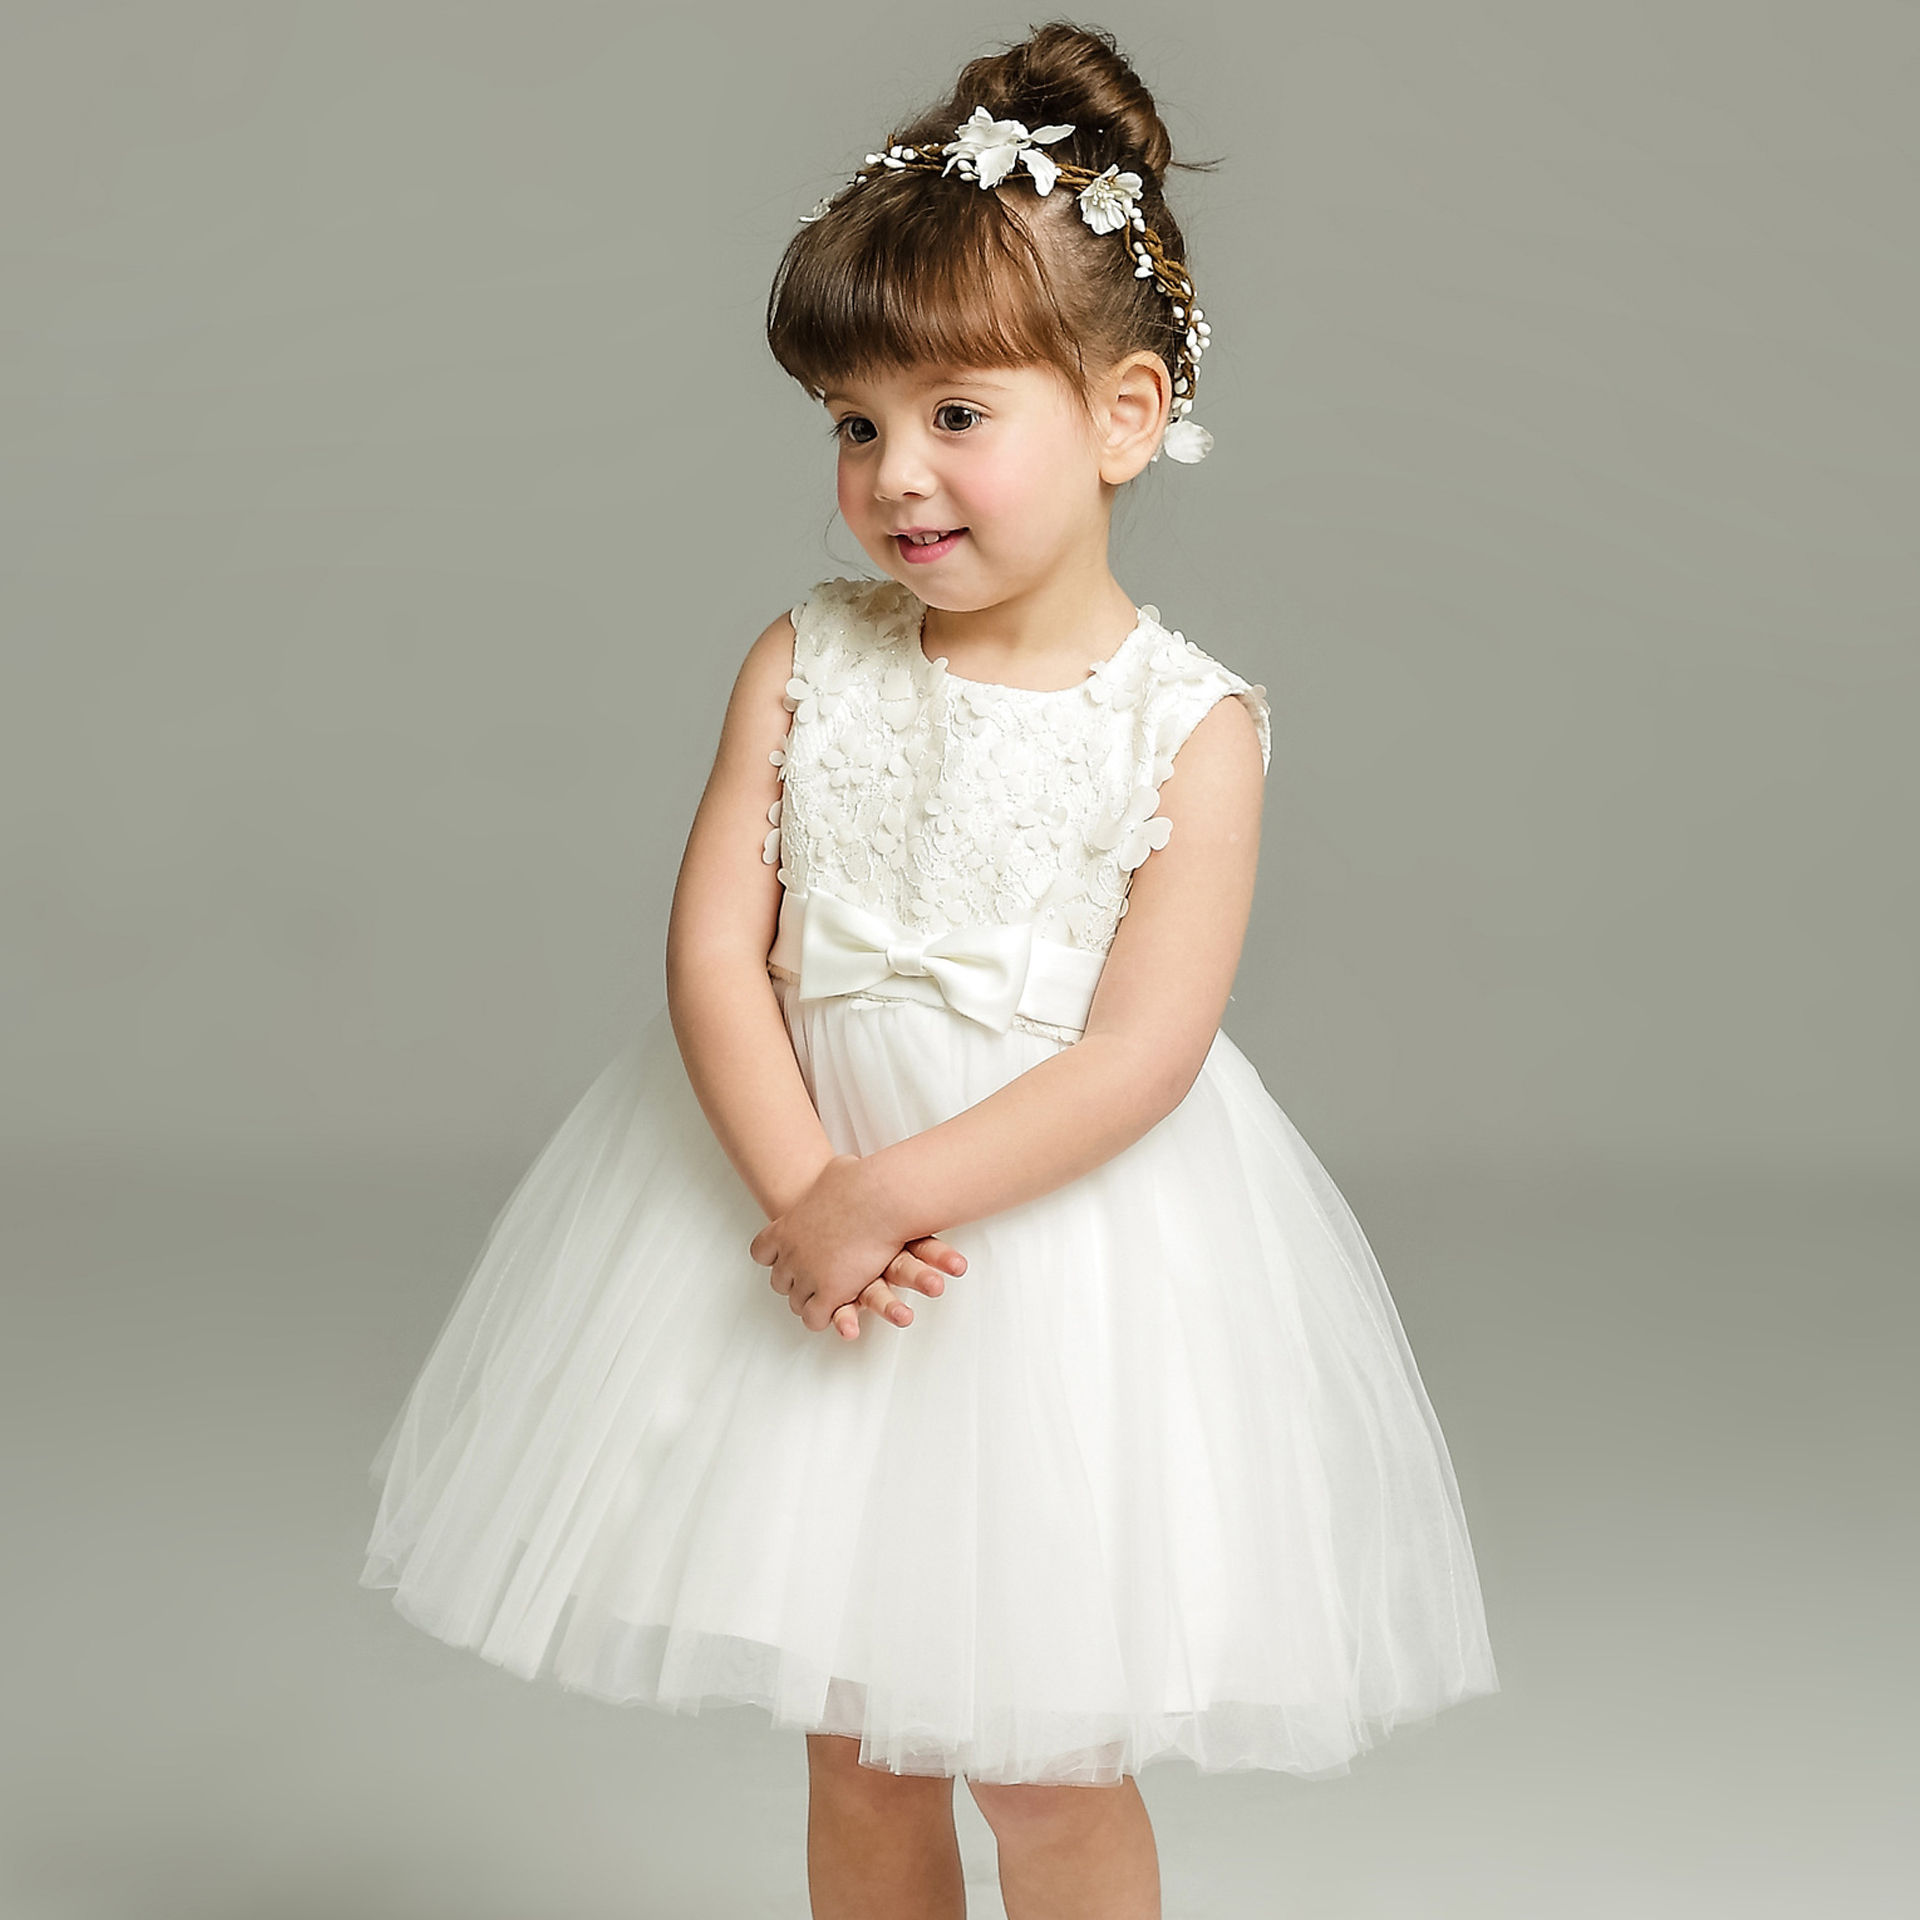 Aliexpress.com : Buy Newborn Dress Baby Girl Christening Gowns ...